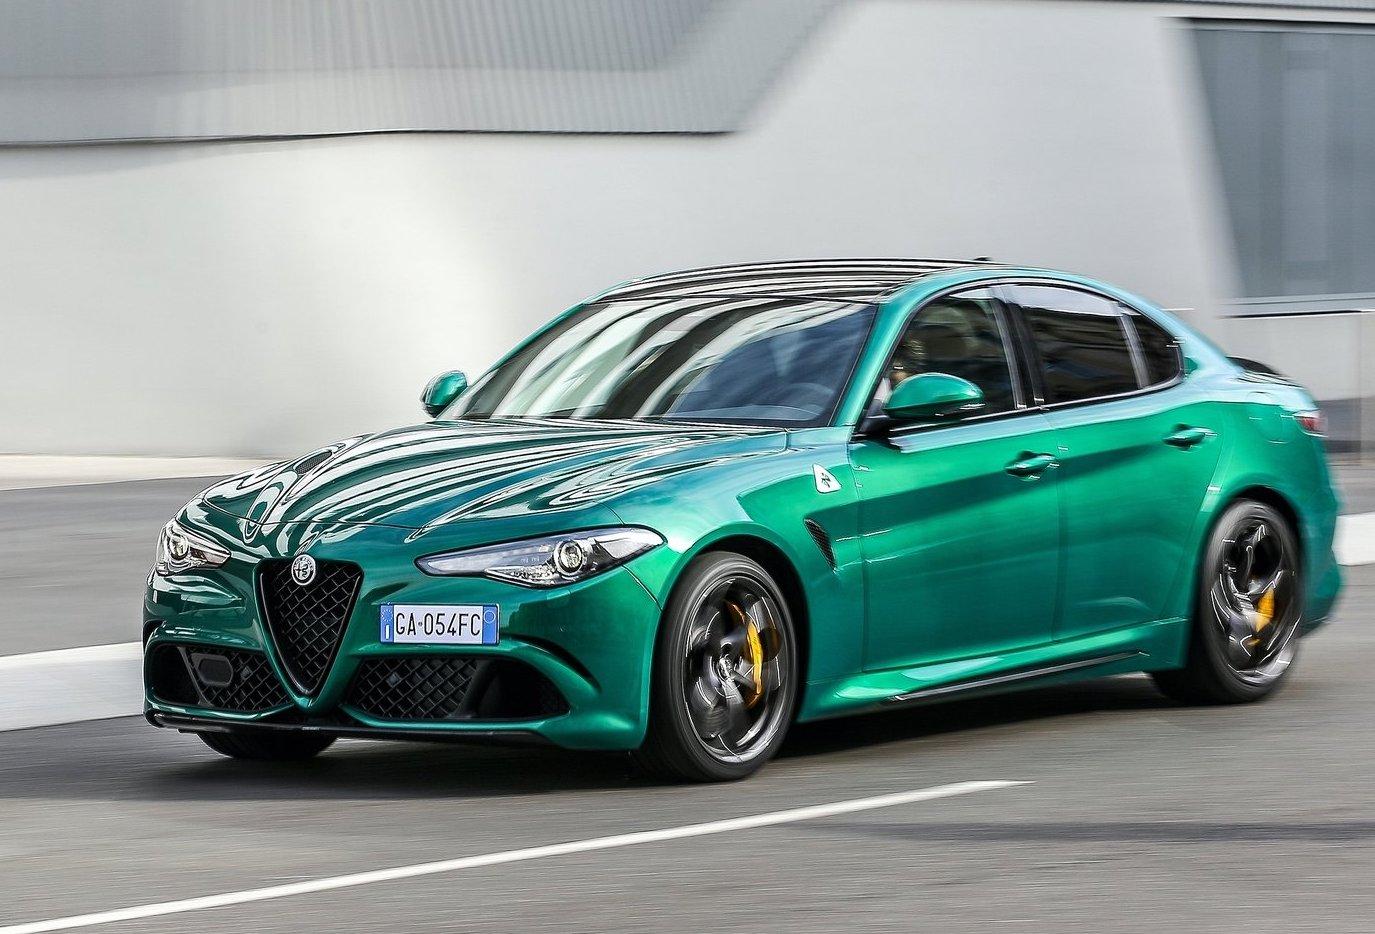 Alfa Romeo Giulia Quadrifoglio Goes Green